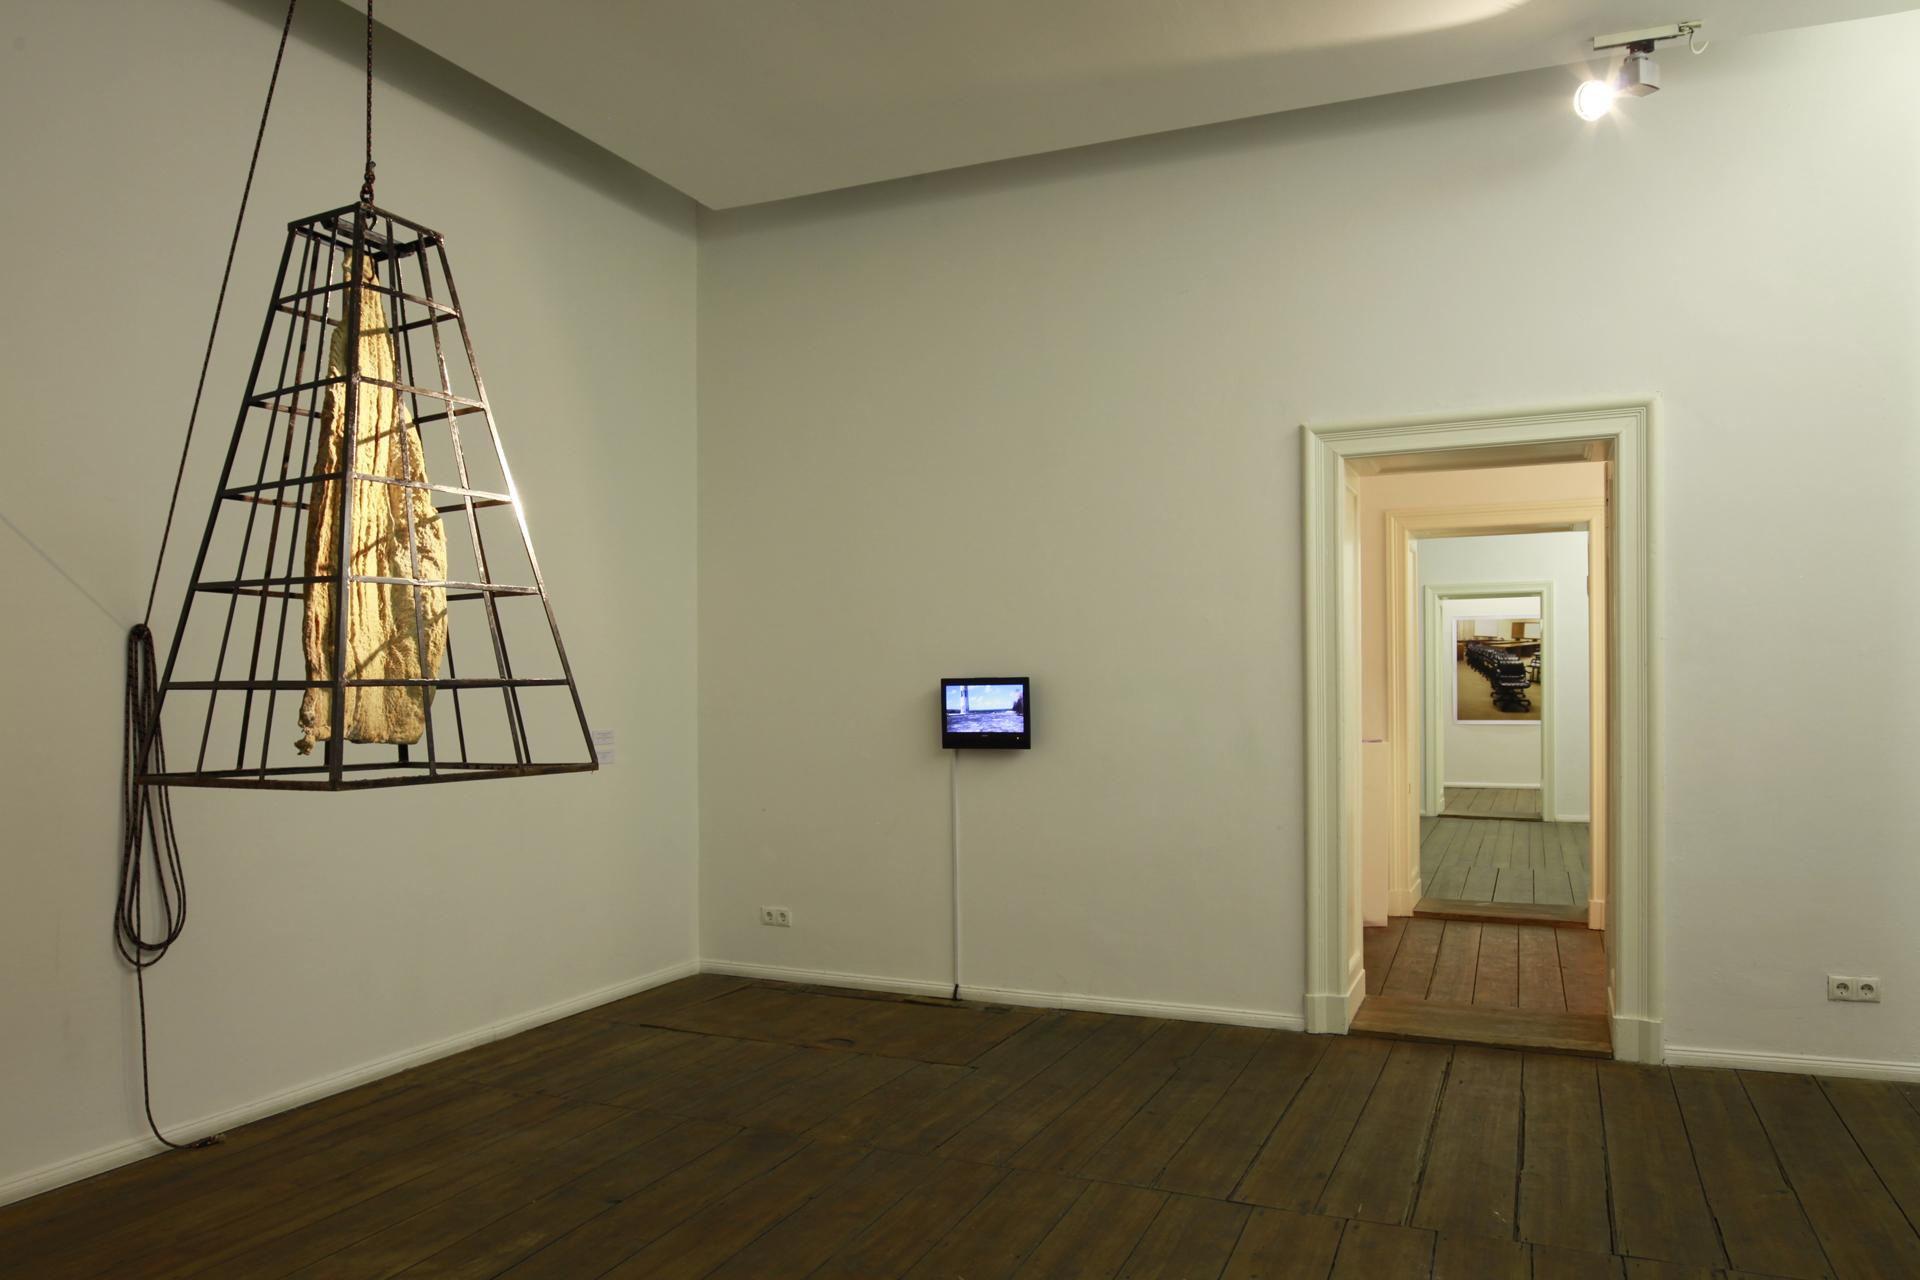 2016_juef_kurator_grimmuseum_15-francisco-klinger-carvalho-katerina-valdivia-bruch-carlos-melo